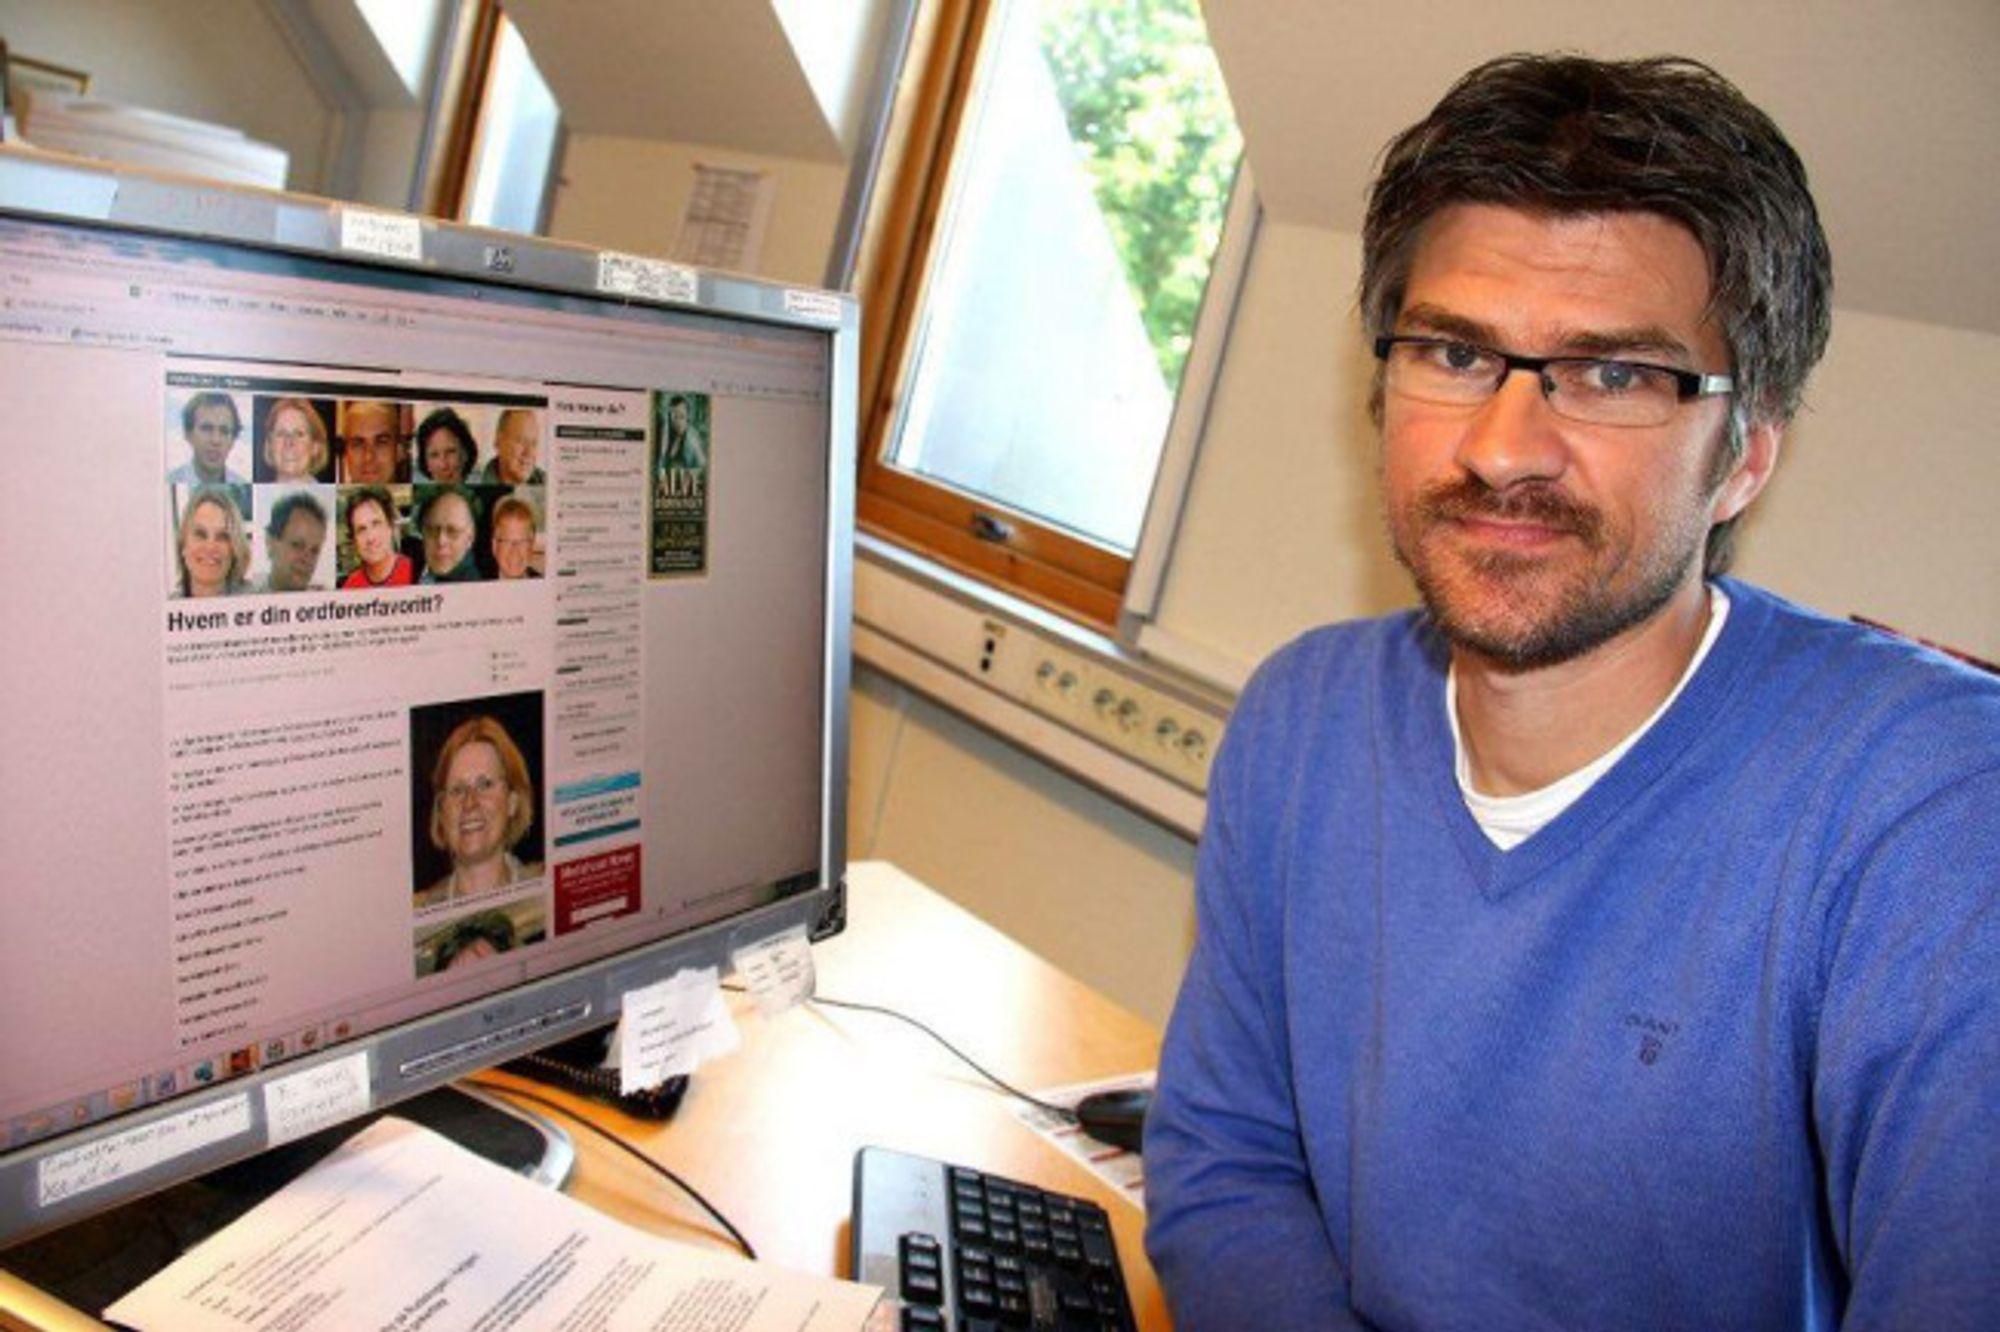 Redaktør og gründer Morten Øby i Sarpsborg24.